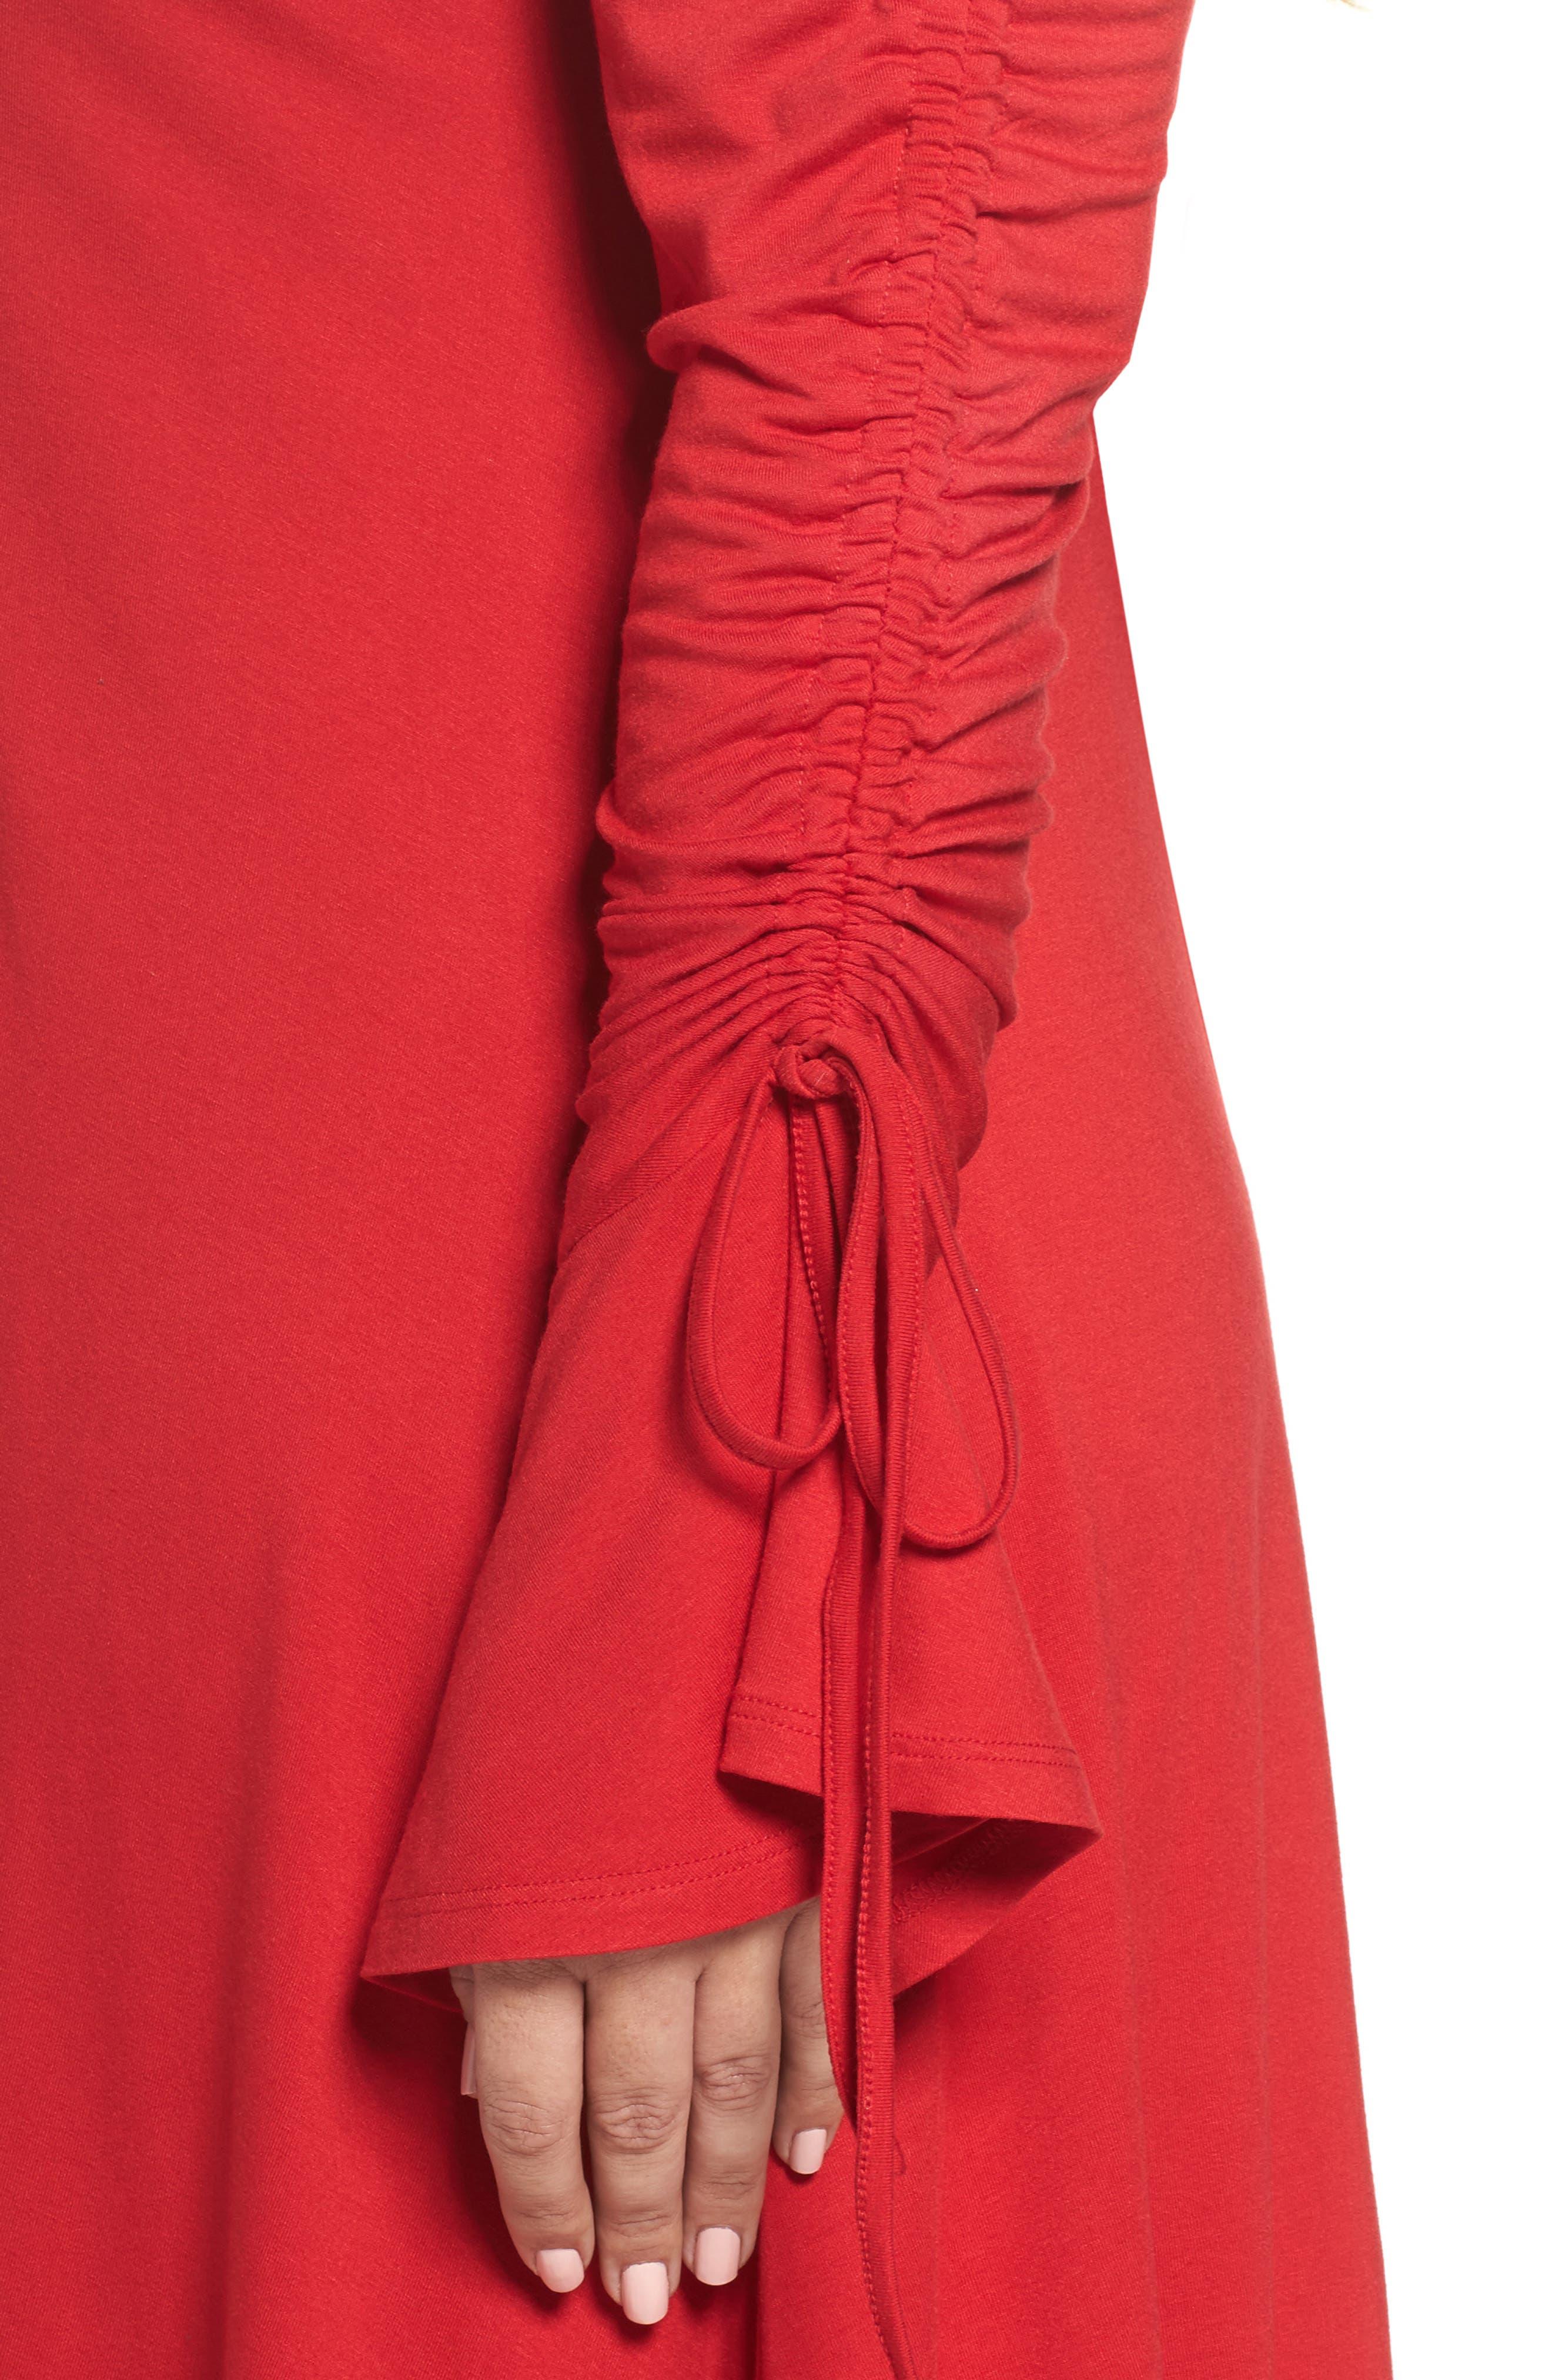 Tulip Sleeve Shift Dress,                             Alternate thumbnail 4, color,                             Red